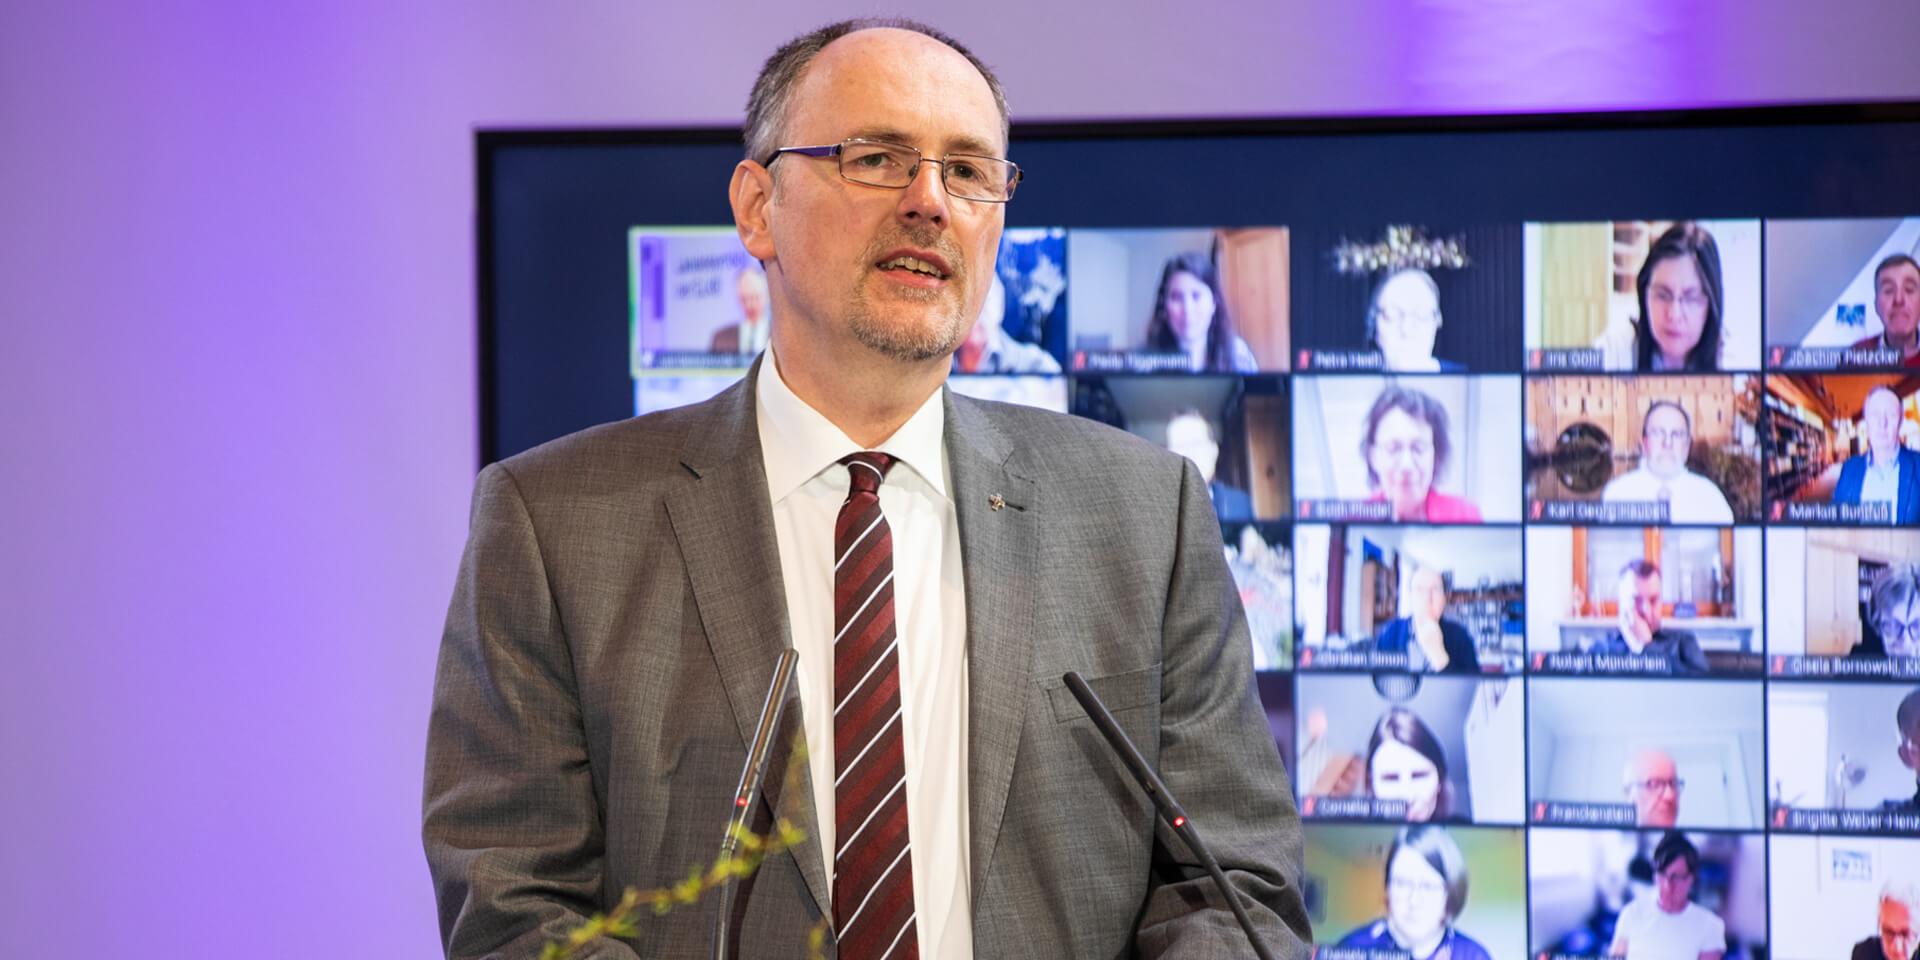 Oberkirchenrat Stefan Reimers